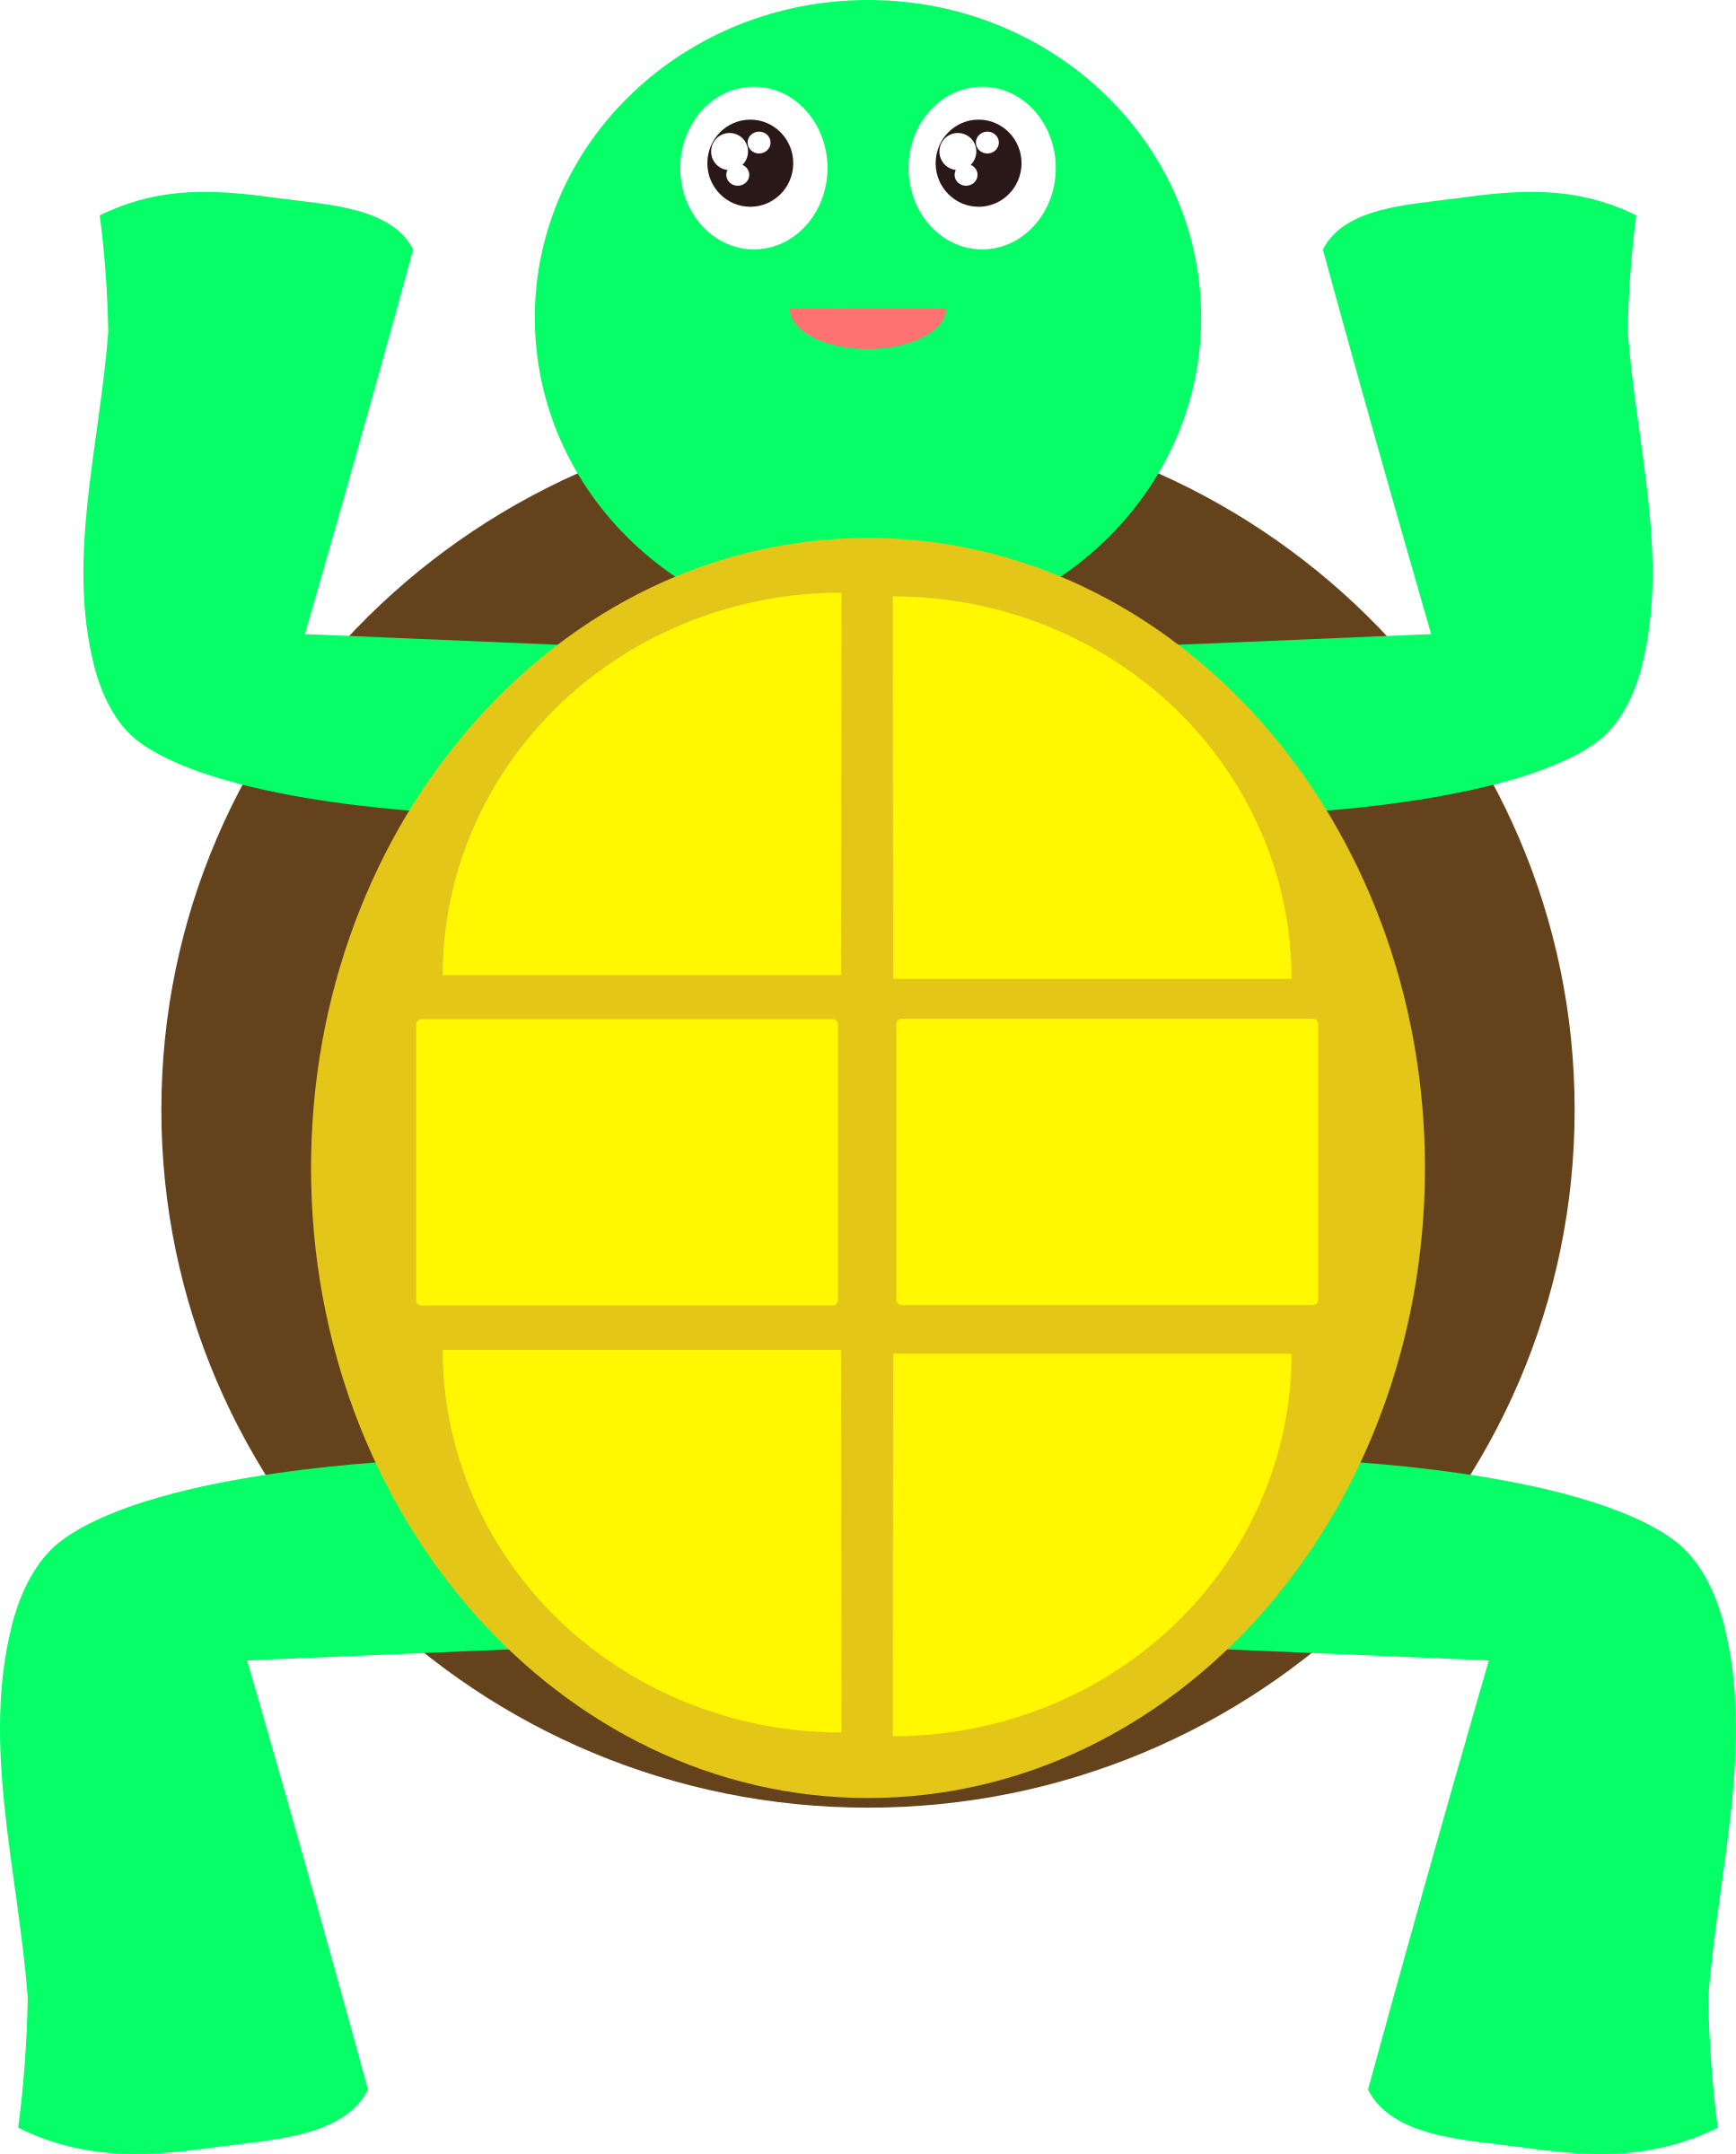 Tortoise Green Sea Turtle Reptile Animated Cute Gif Turtle